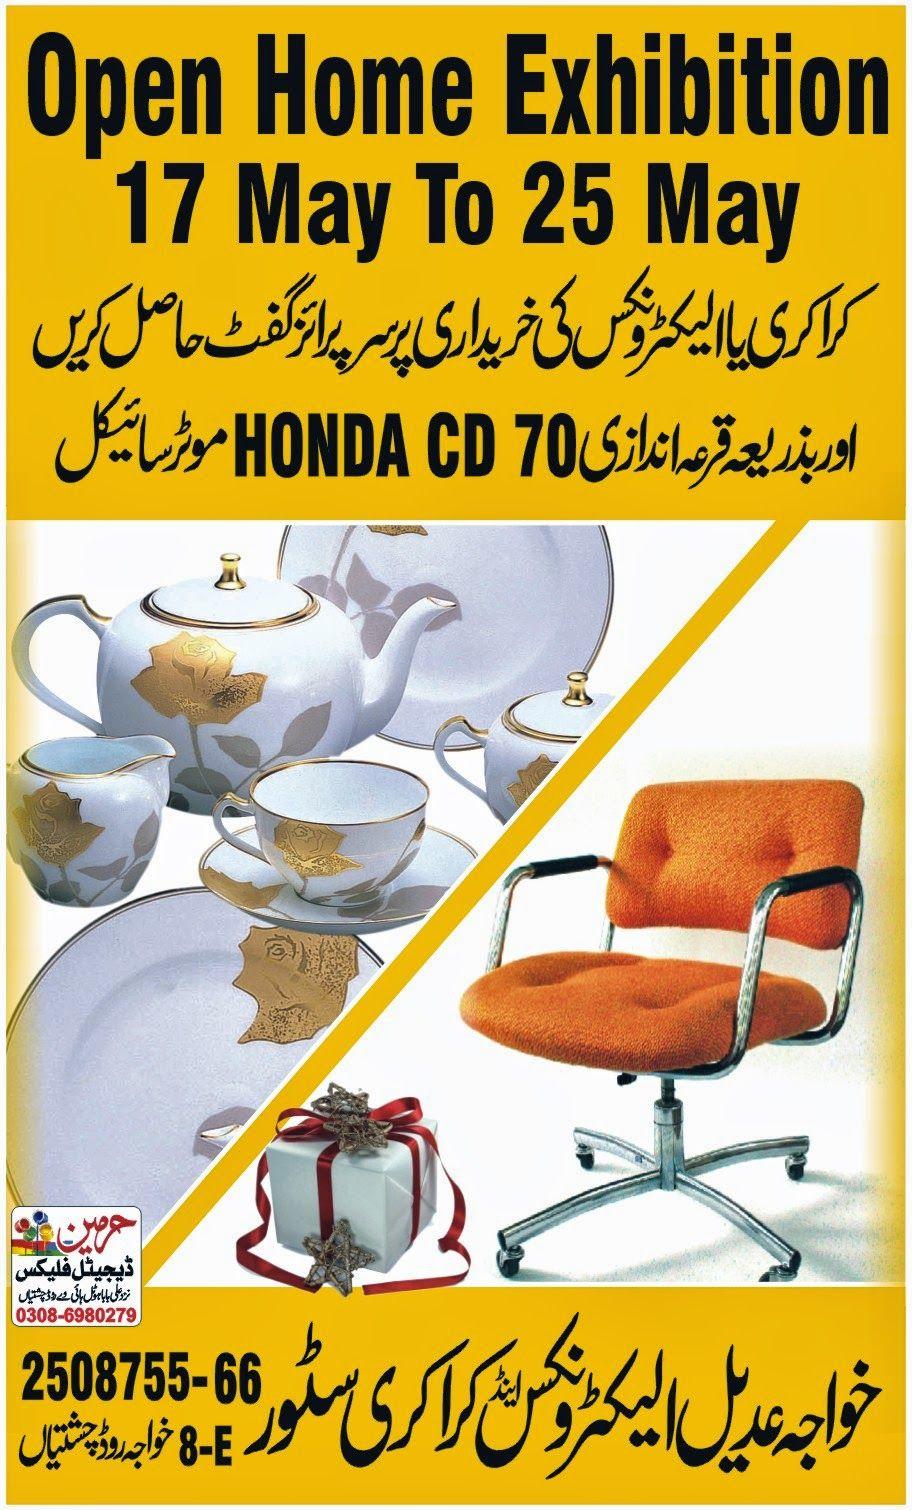 Madani Digital Flex Dahranwala Flex Design Khawaja Adeel